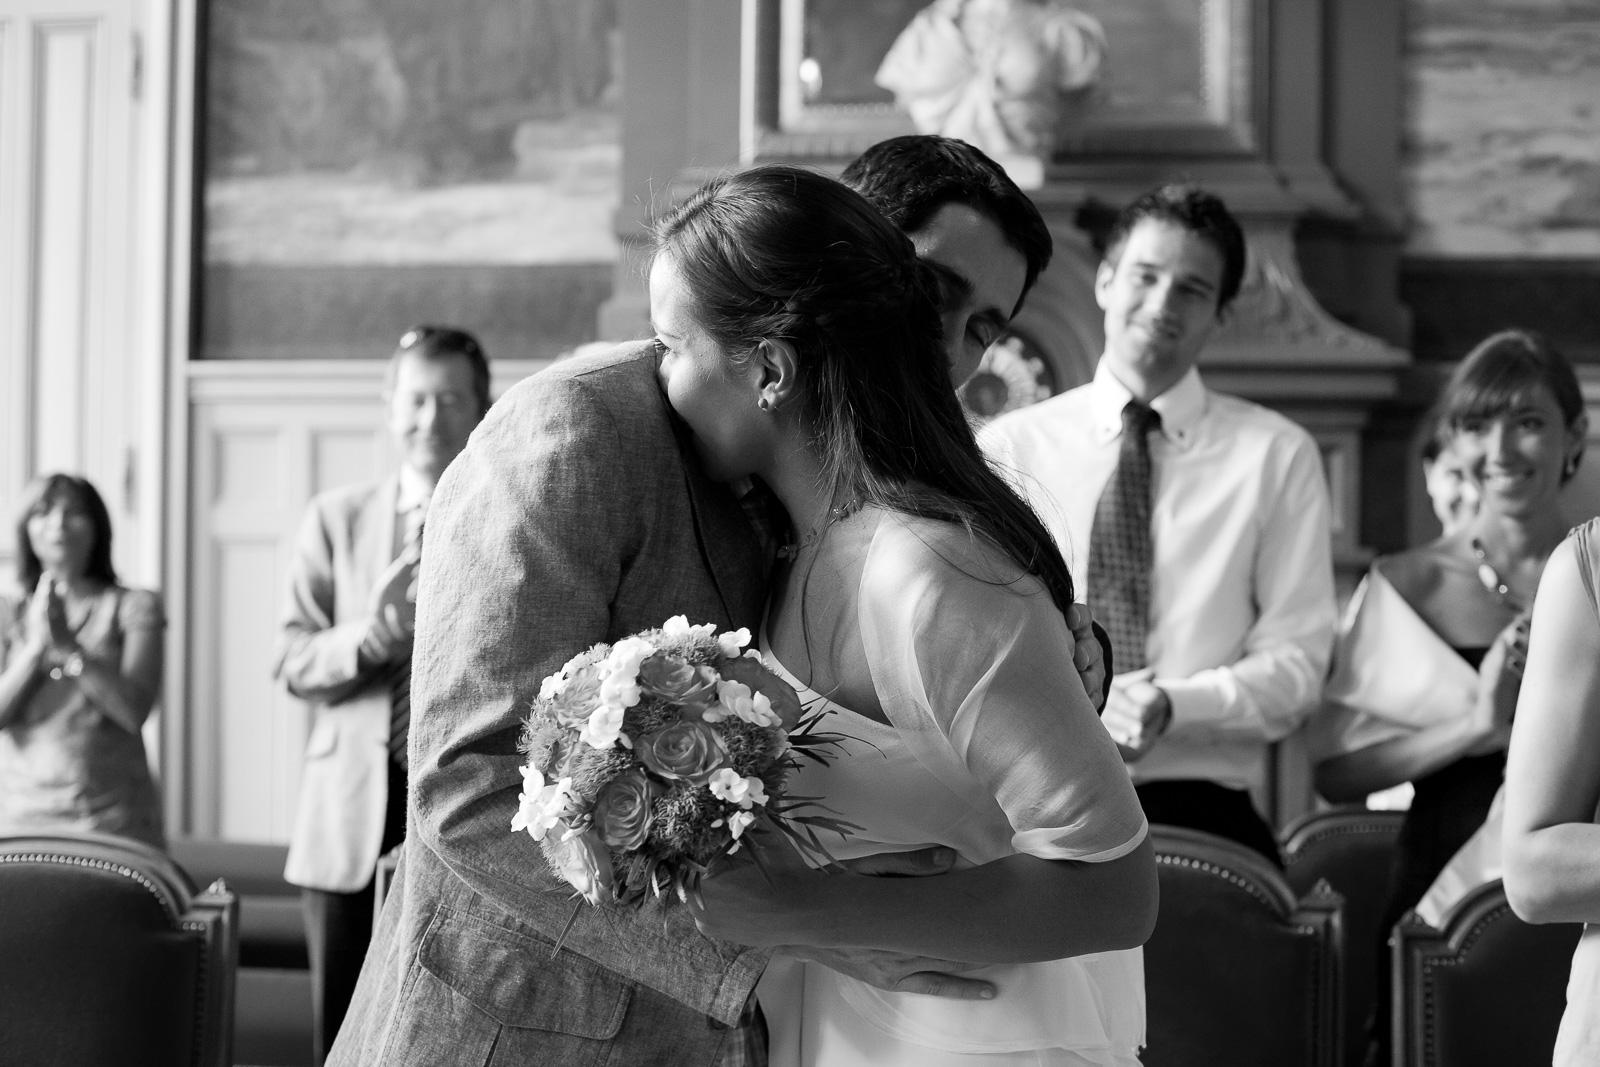 lm_20110715_185824_fr_paris_mariage_julie-david_